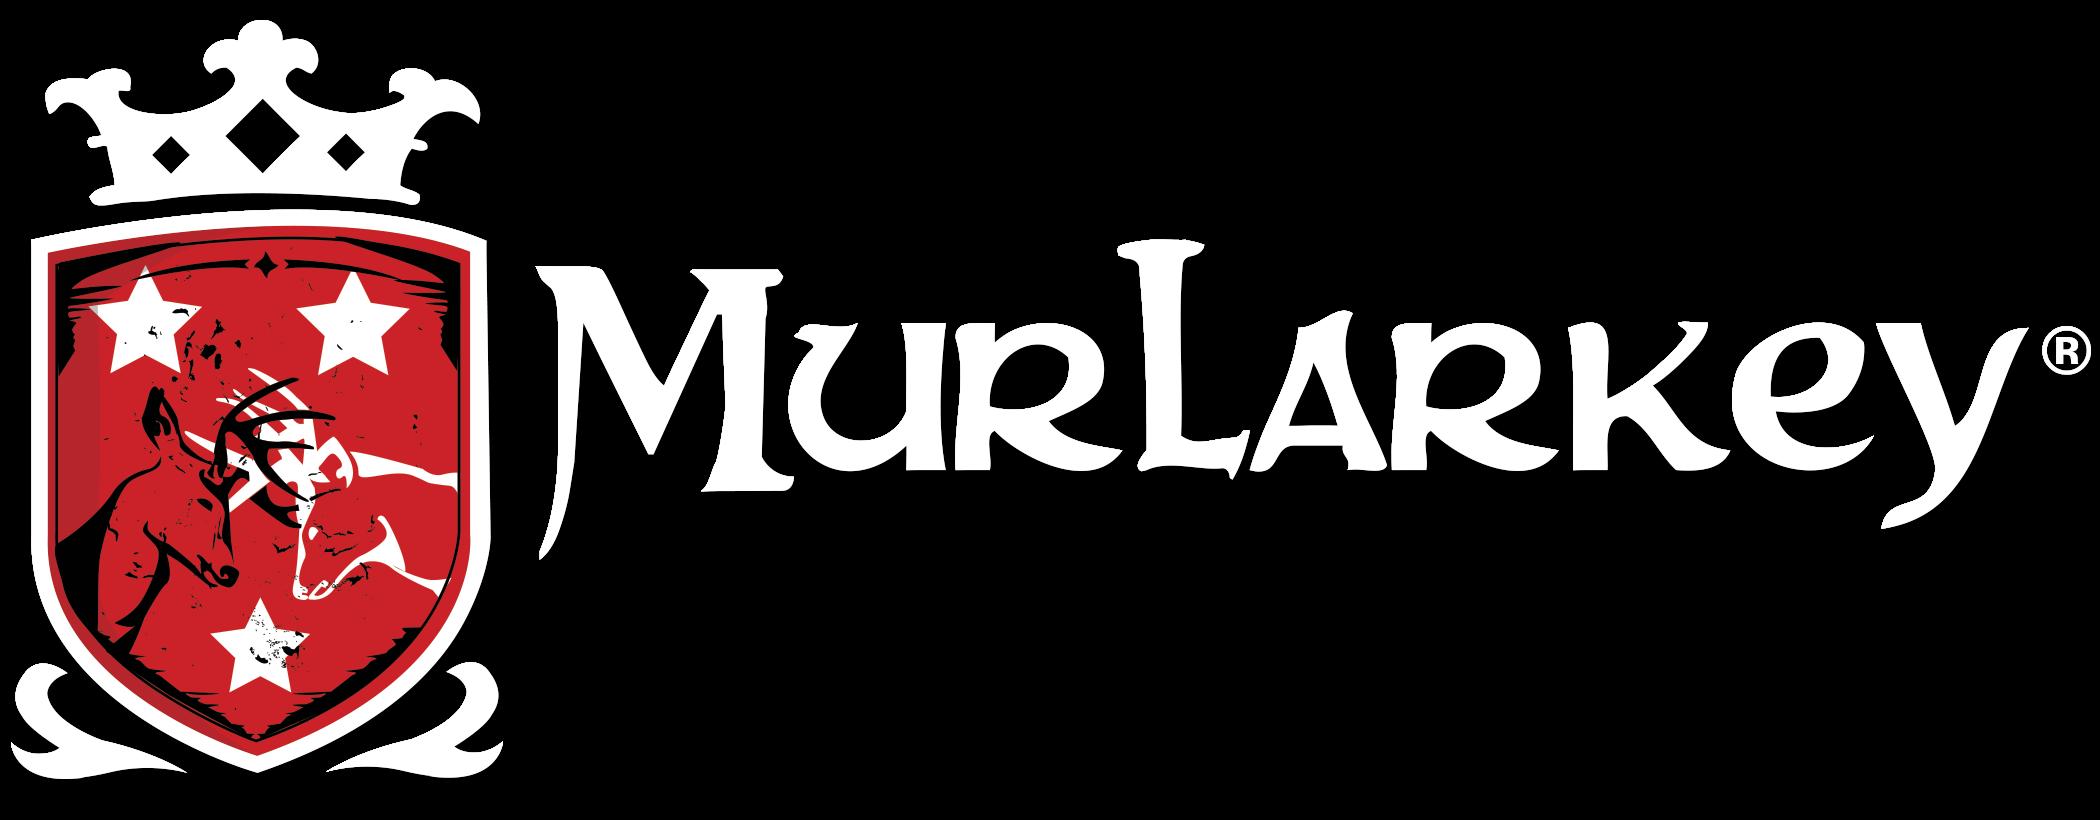 https://murlarkey.com/wp-content/uploads/2020/11/MURLARKEY.LOGO_.WHITE-HORIZ-noLCC-DS.png